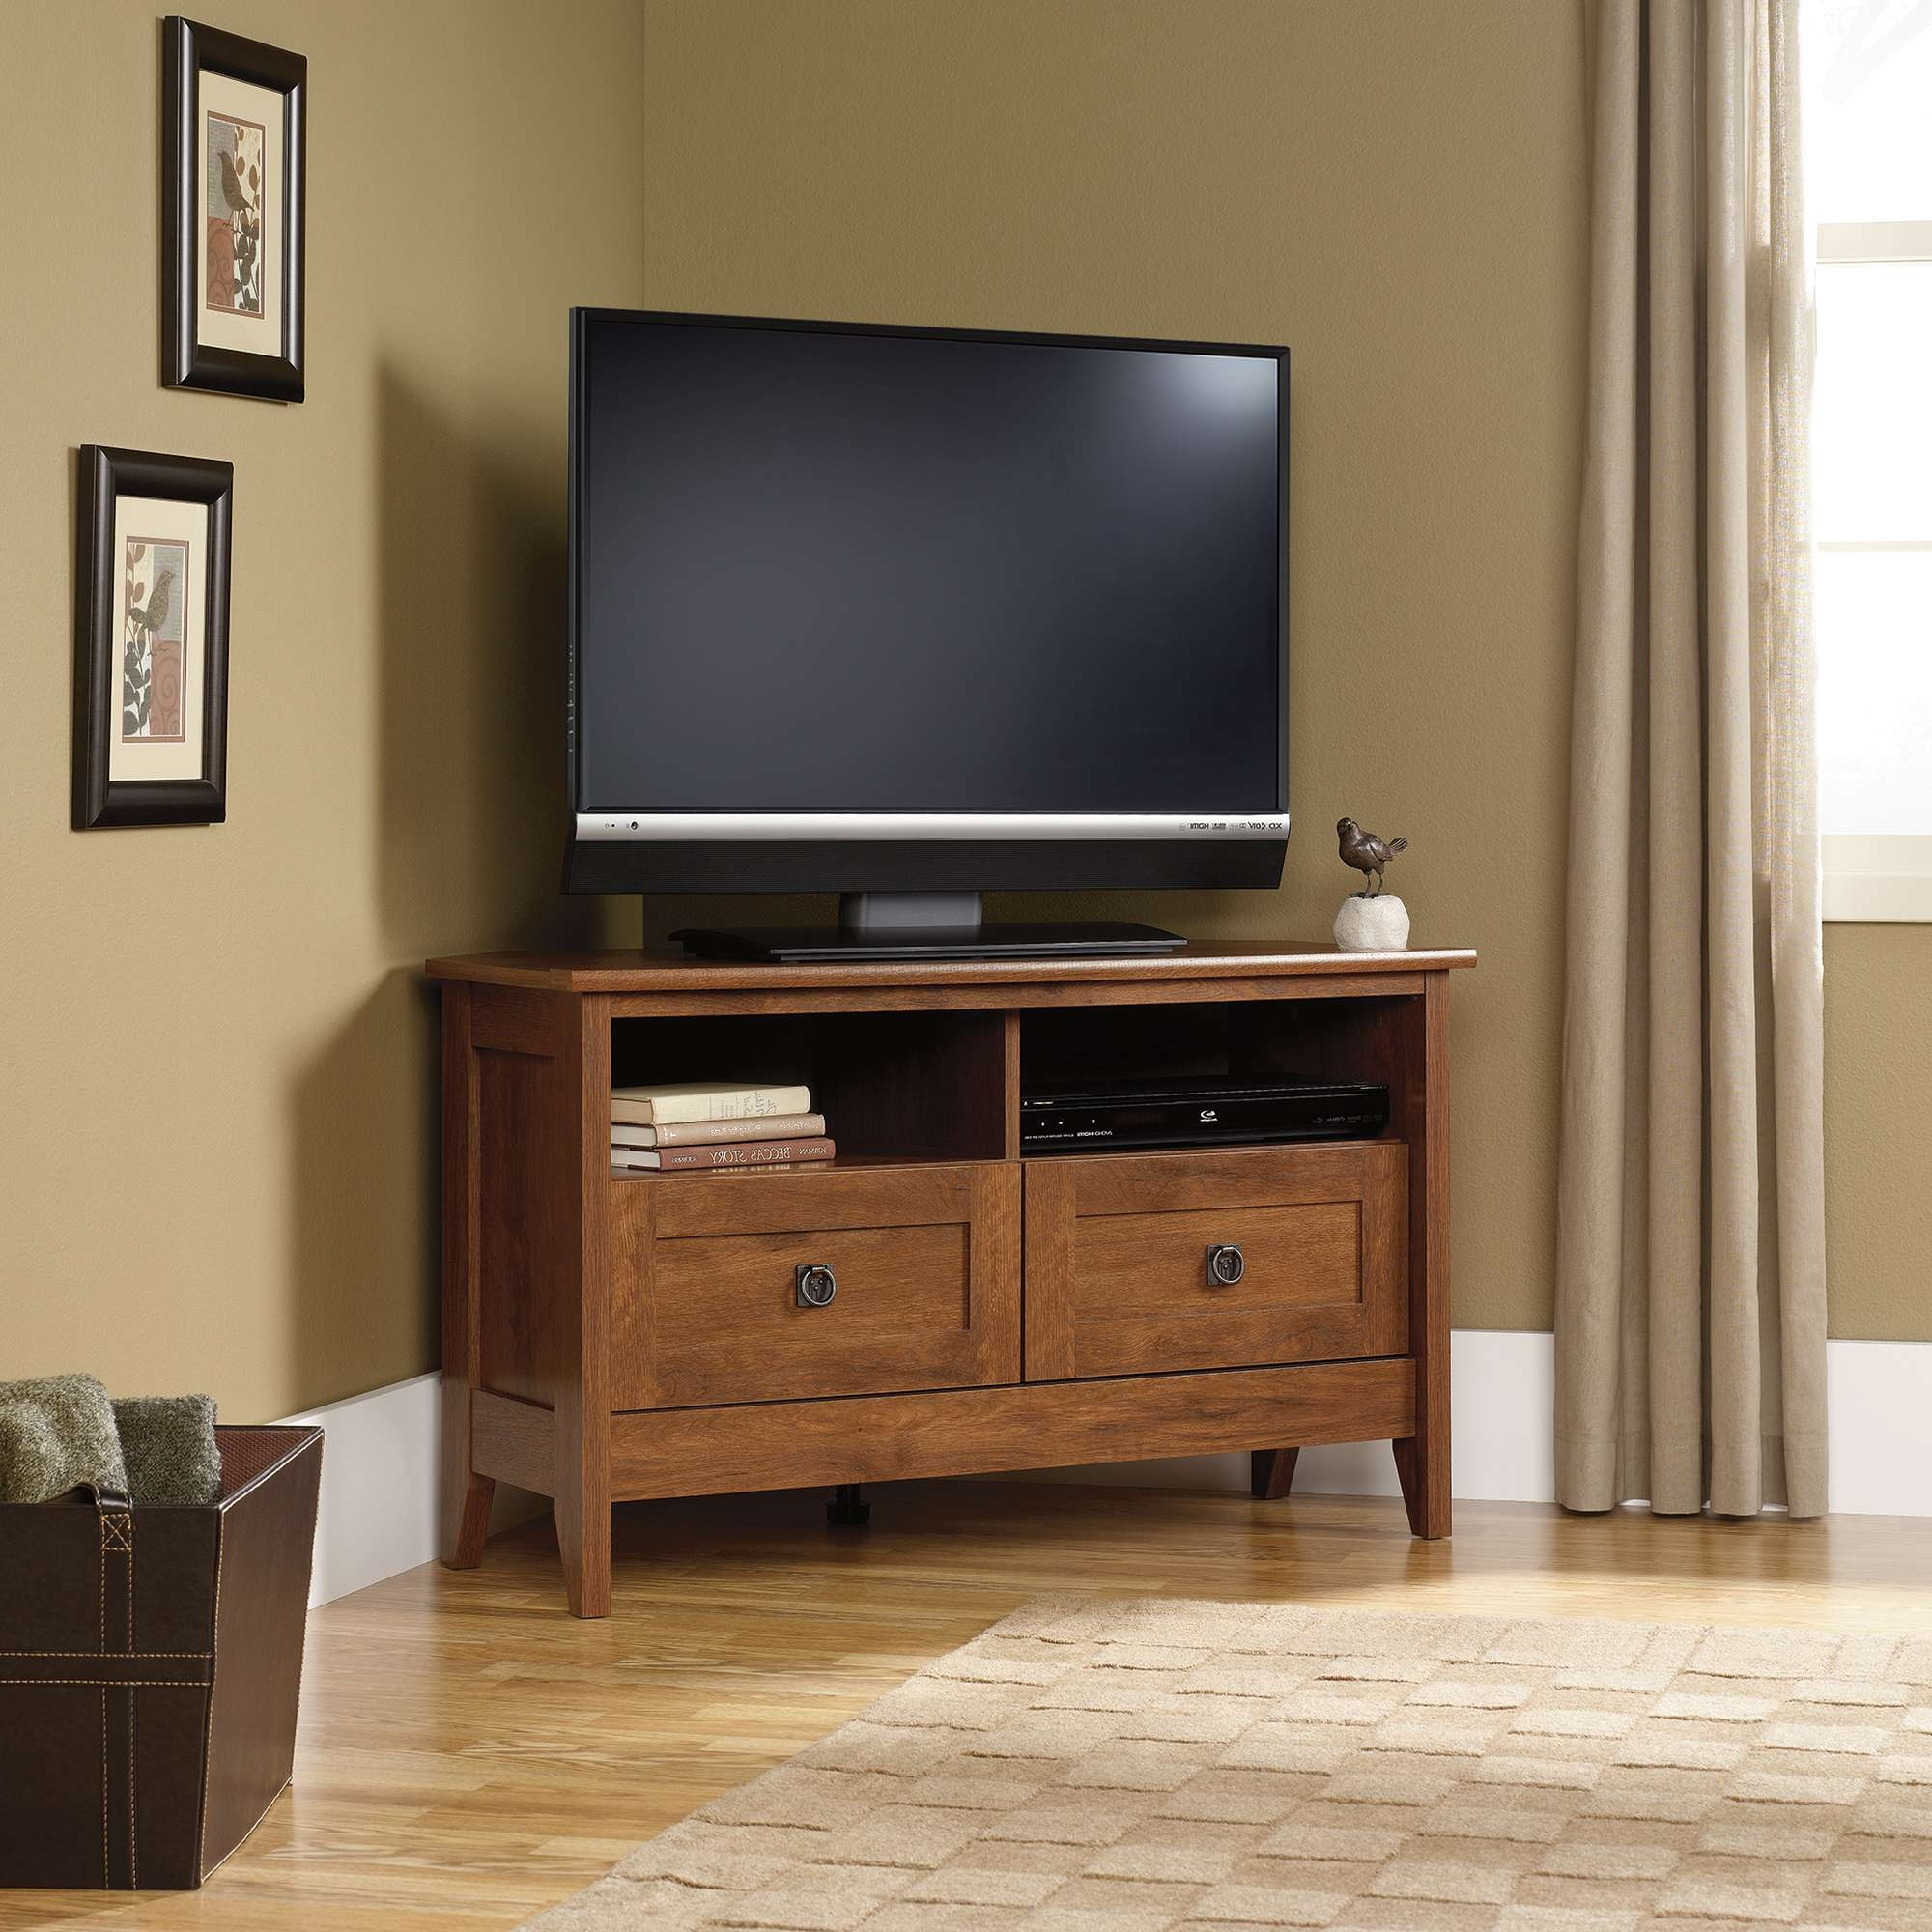 Sauder Select | Corner Tv Stand | 410627 | Sauder For Tv Stands Corner Units (View 14 of 15)